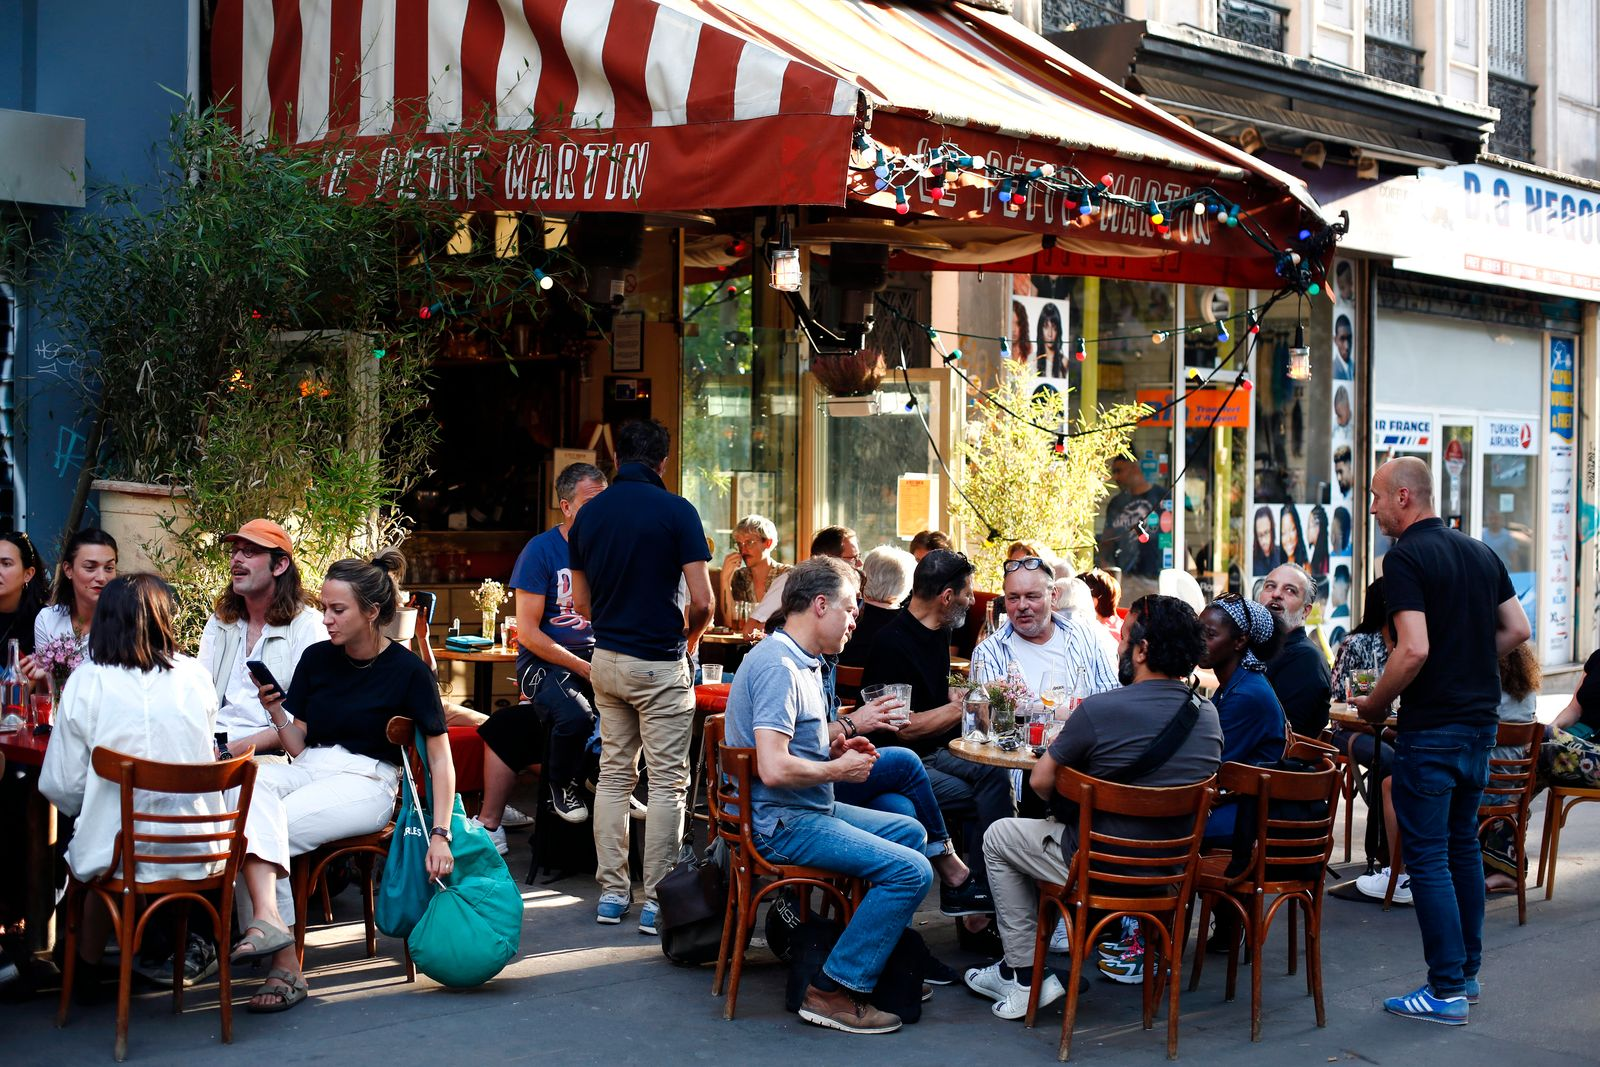 Virus Outbreak Paris Cafes Photo Gallery